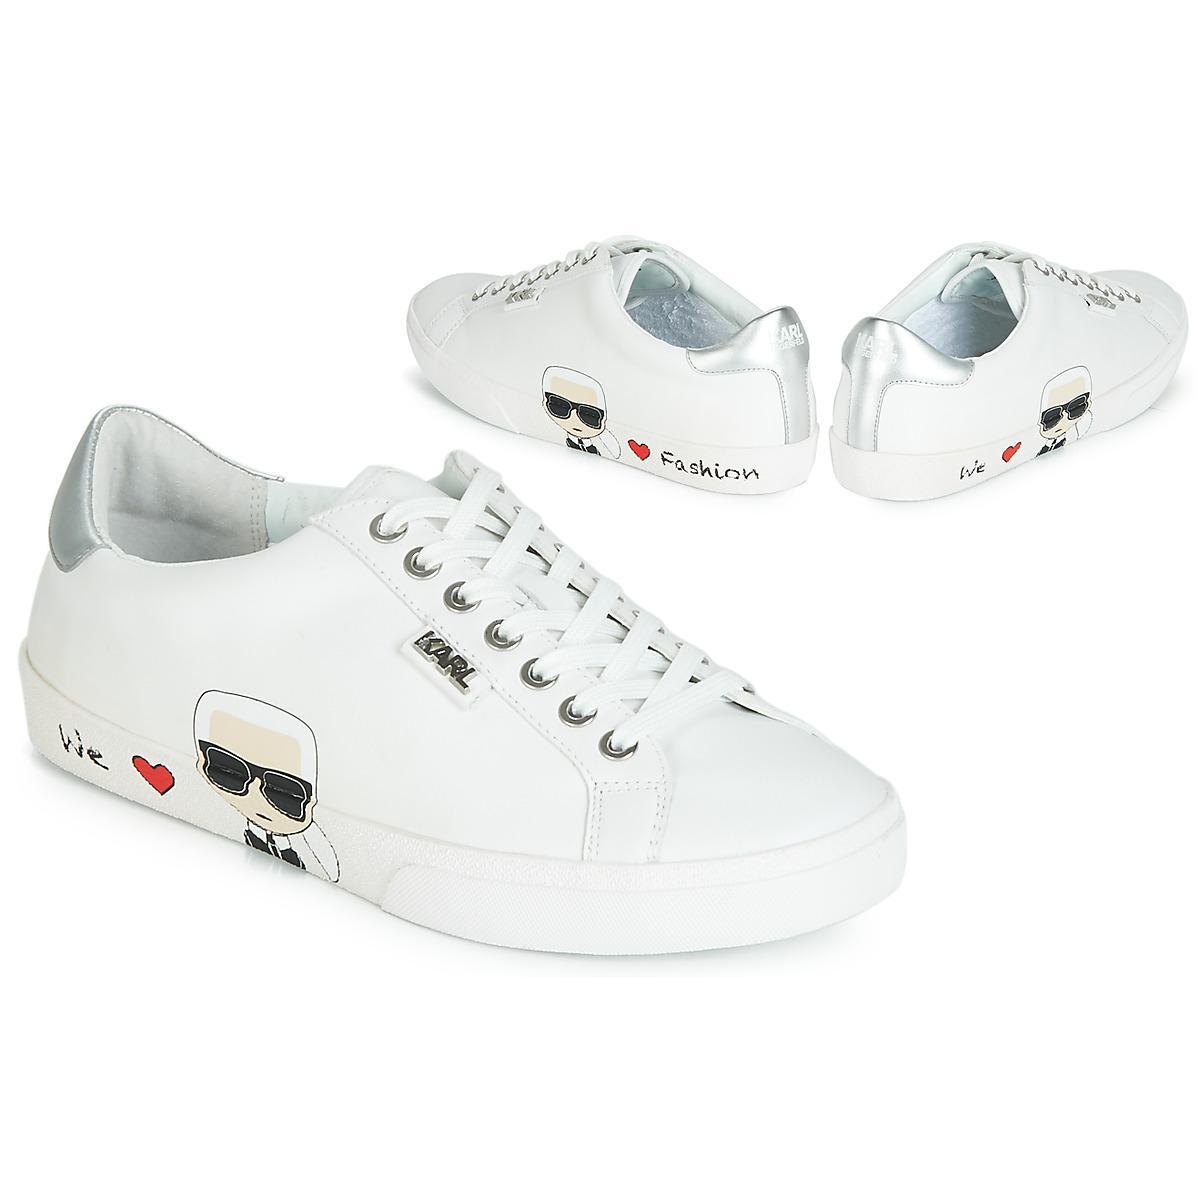 3fc43919737 Karl Lagerfeld Skool Karl Ikonic Lo Women s Shoes (trainers) In ...